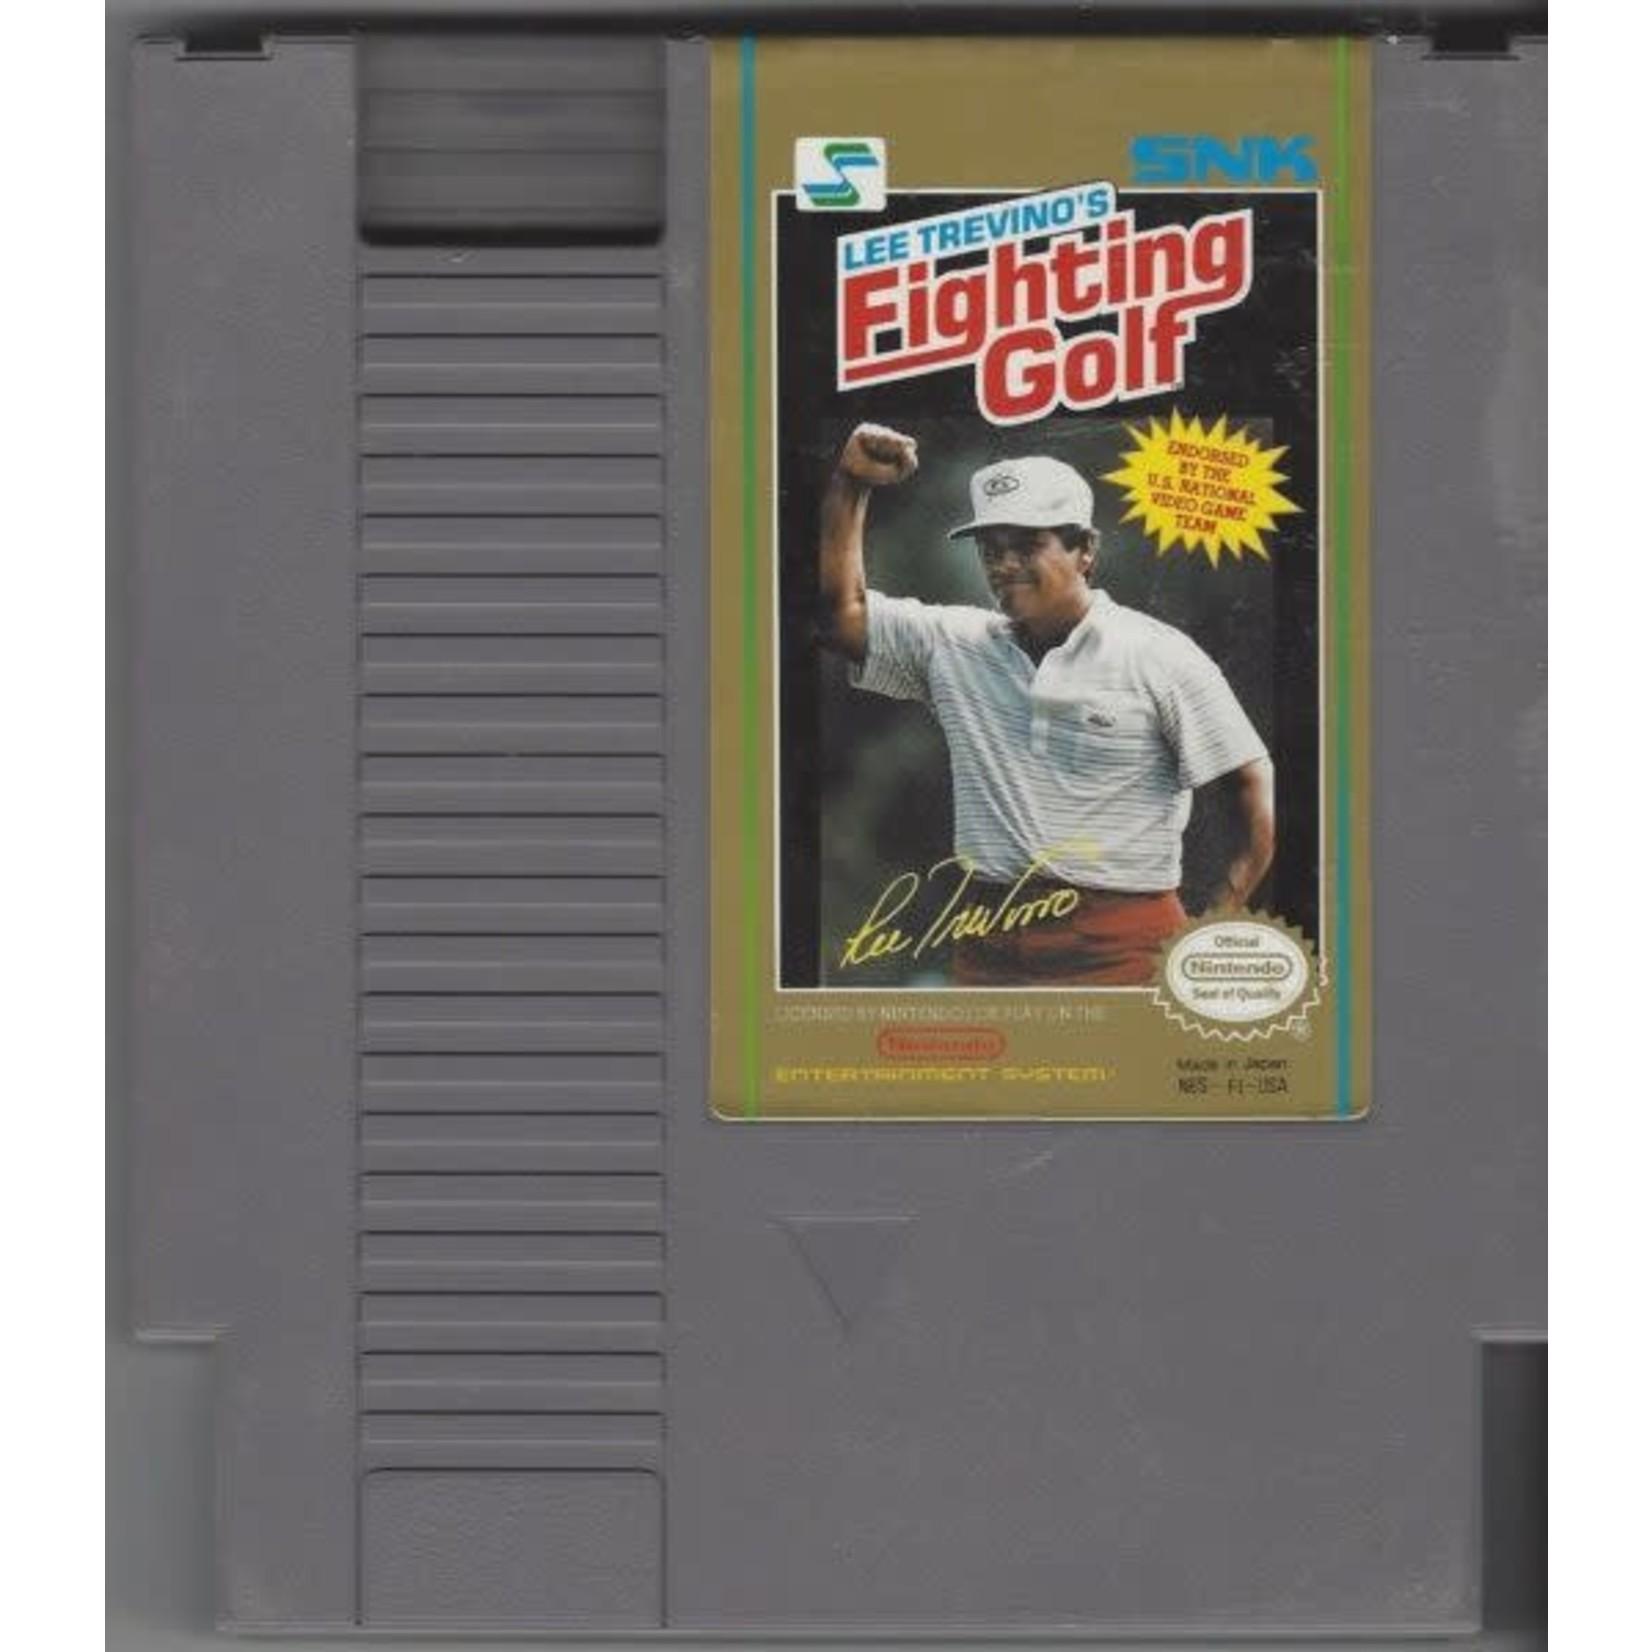 Lee Trevino's Fighting Golf (NES)